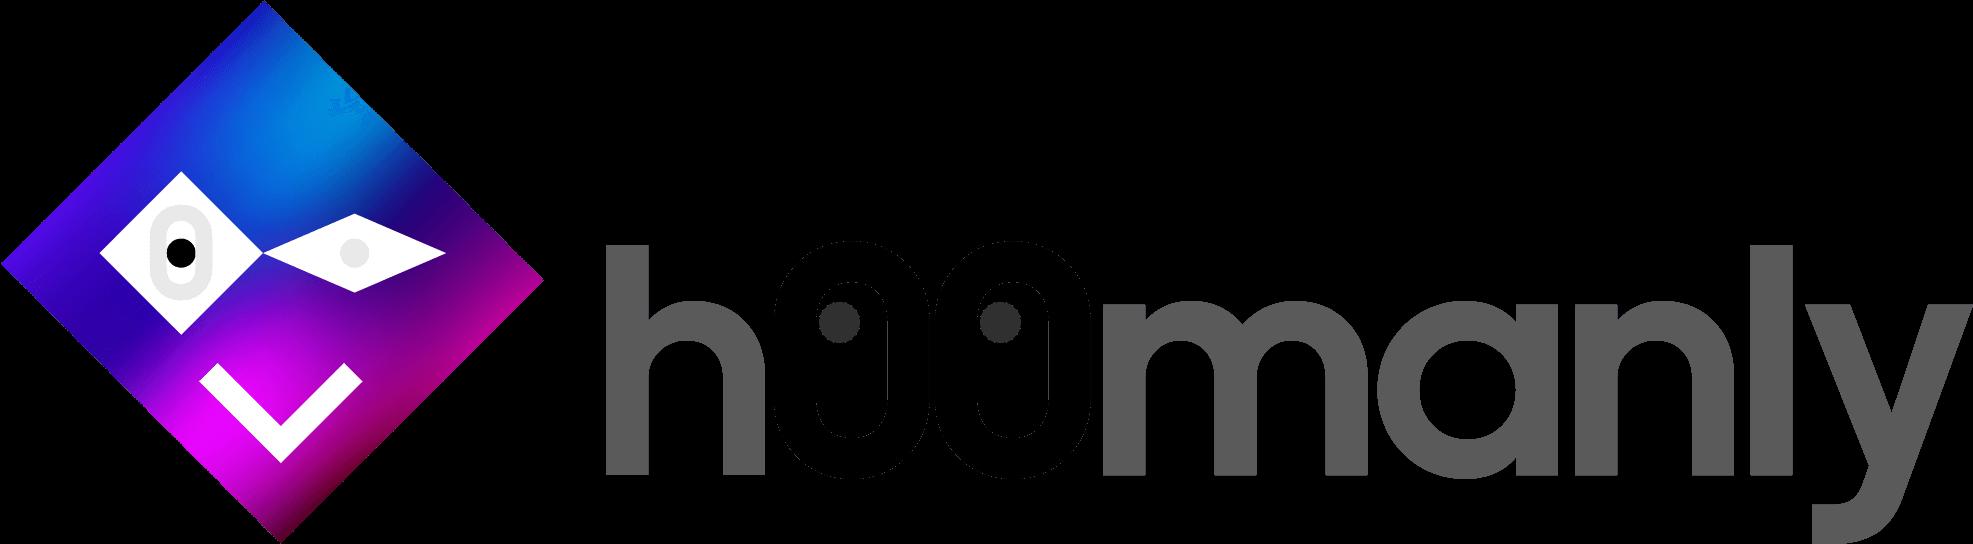 h00manly - Community-driven NFT Cryptoart